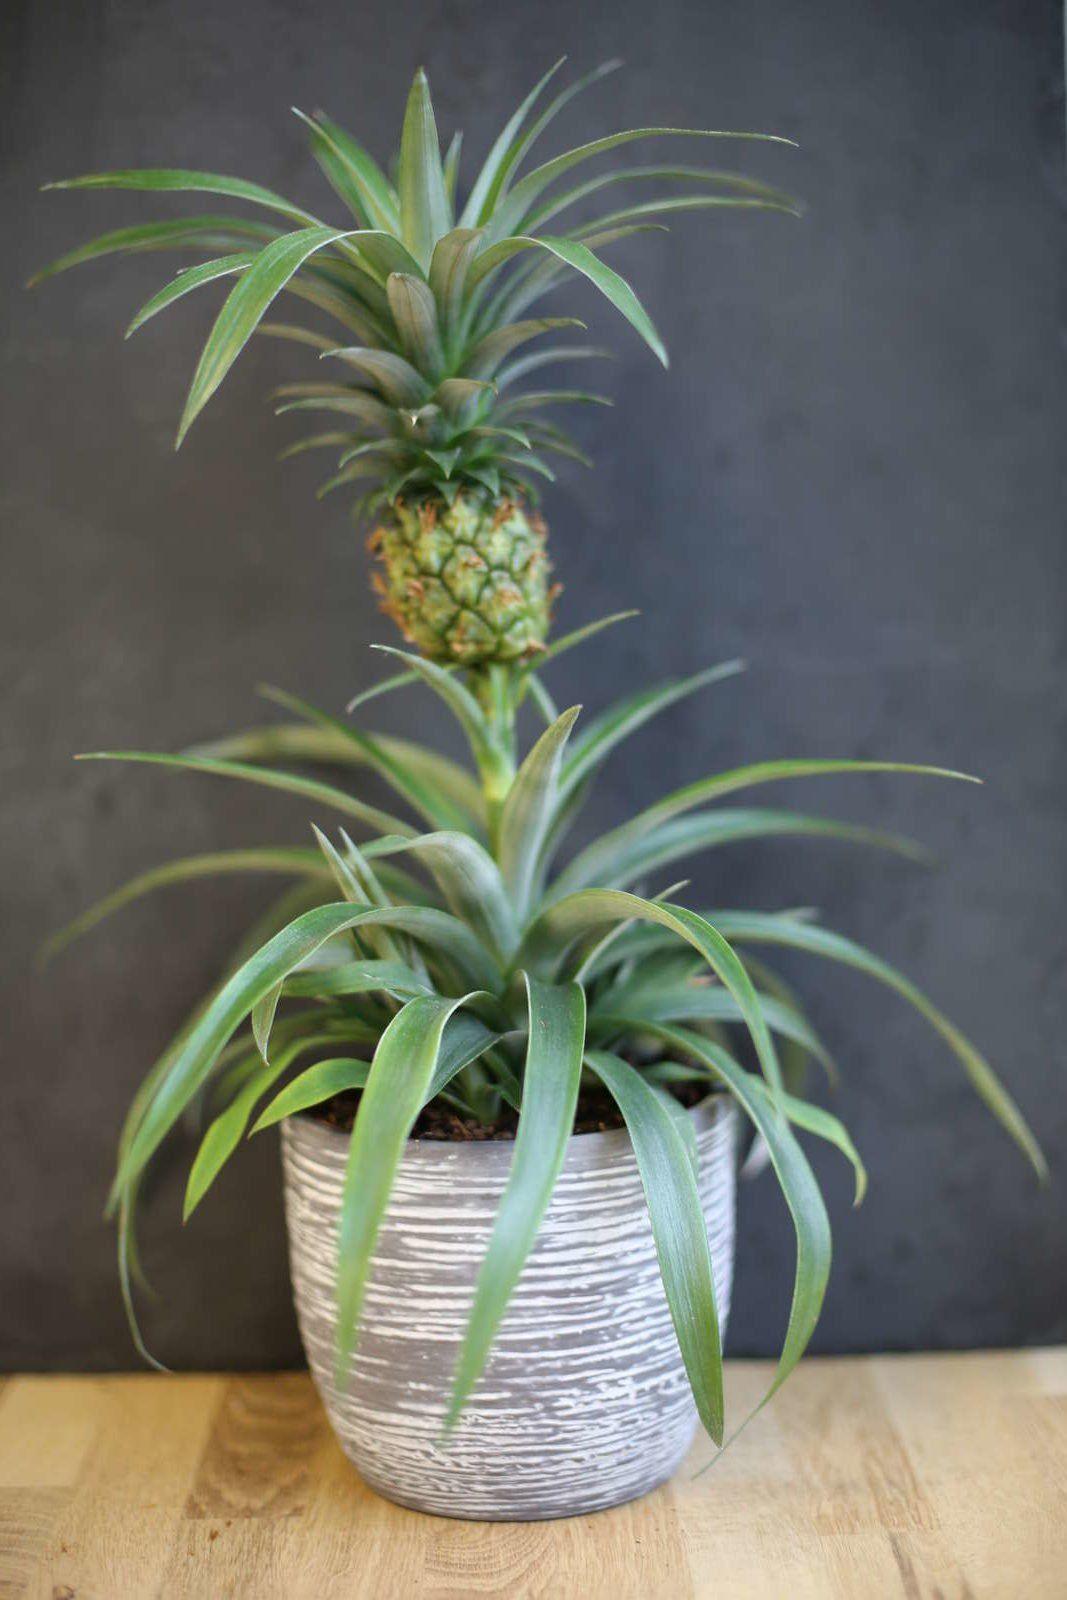 Ananas Anpflanzen Vermehrung Anbau Anleitung Pflanzen